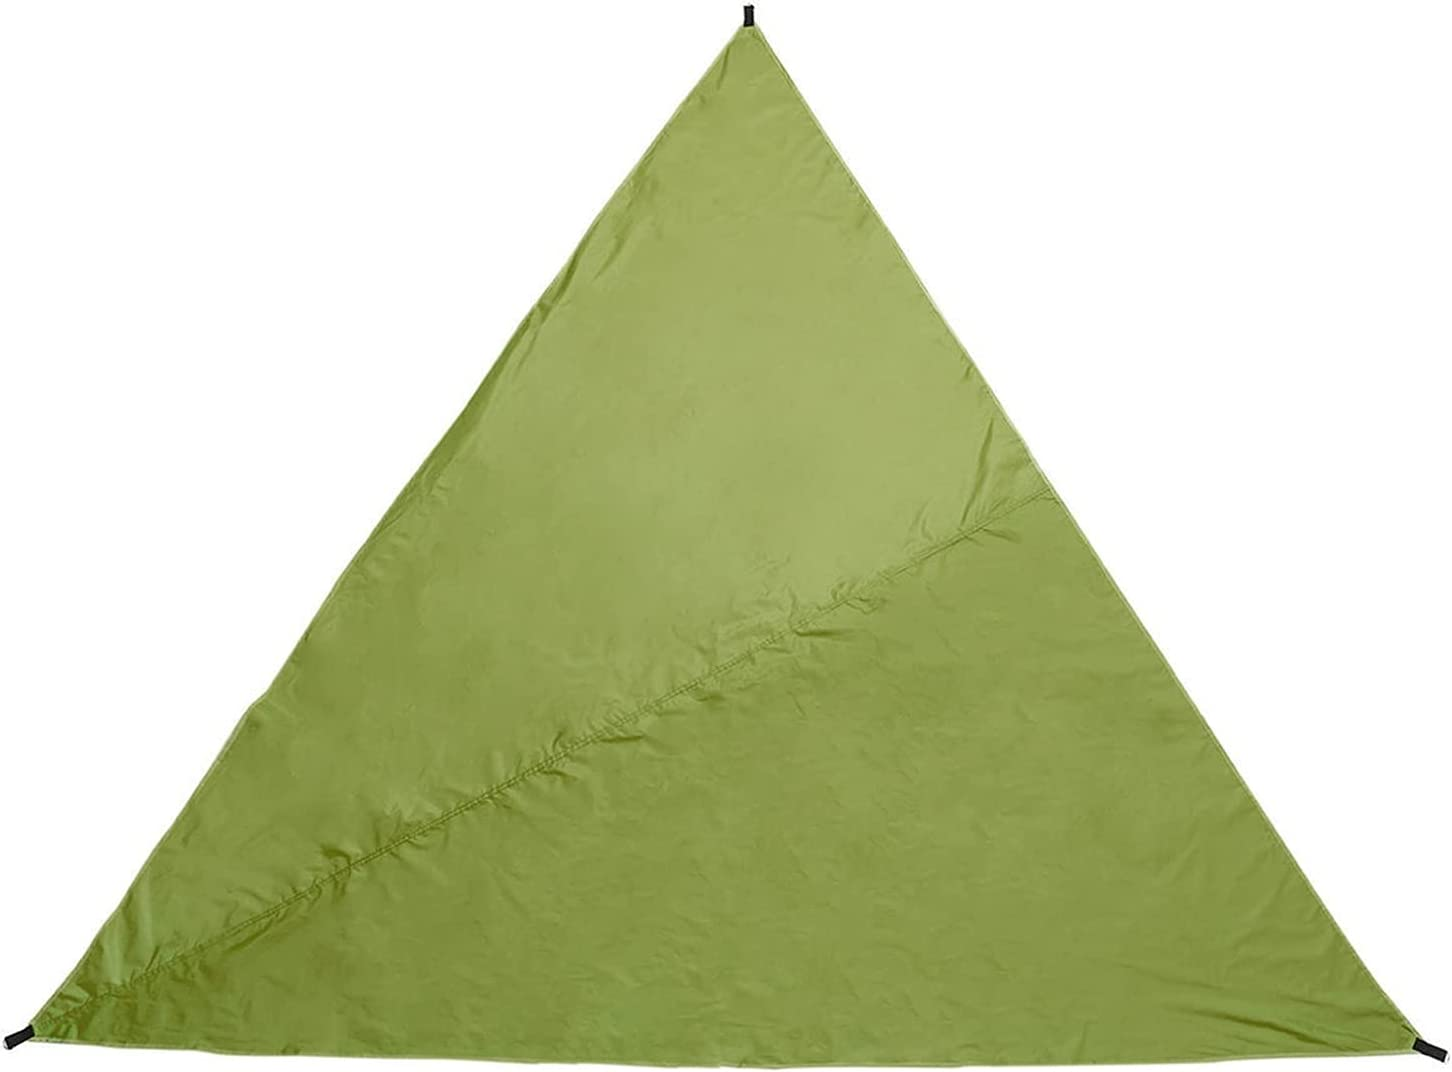 70% OFF Outlet XUEMEI 3m Triangular Waterproof Tent 2021 Garden Sunshade Patio Awnin